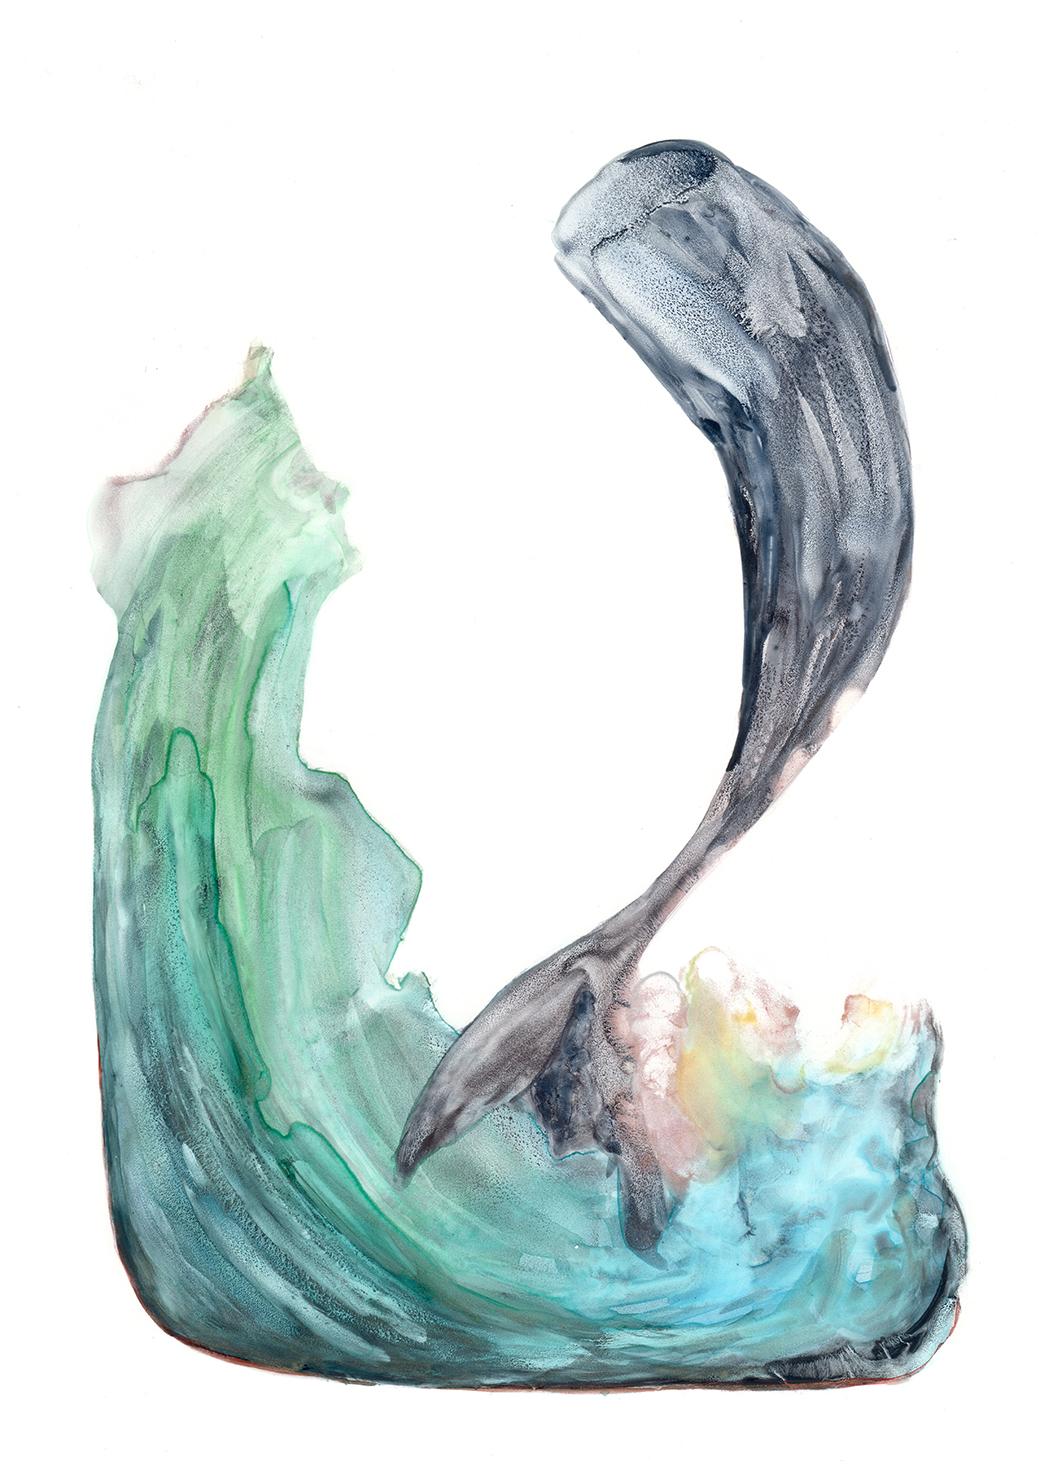 The Ocean Weeps Polyethylene Terephthalate